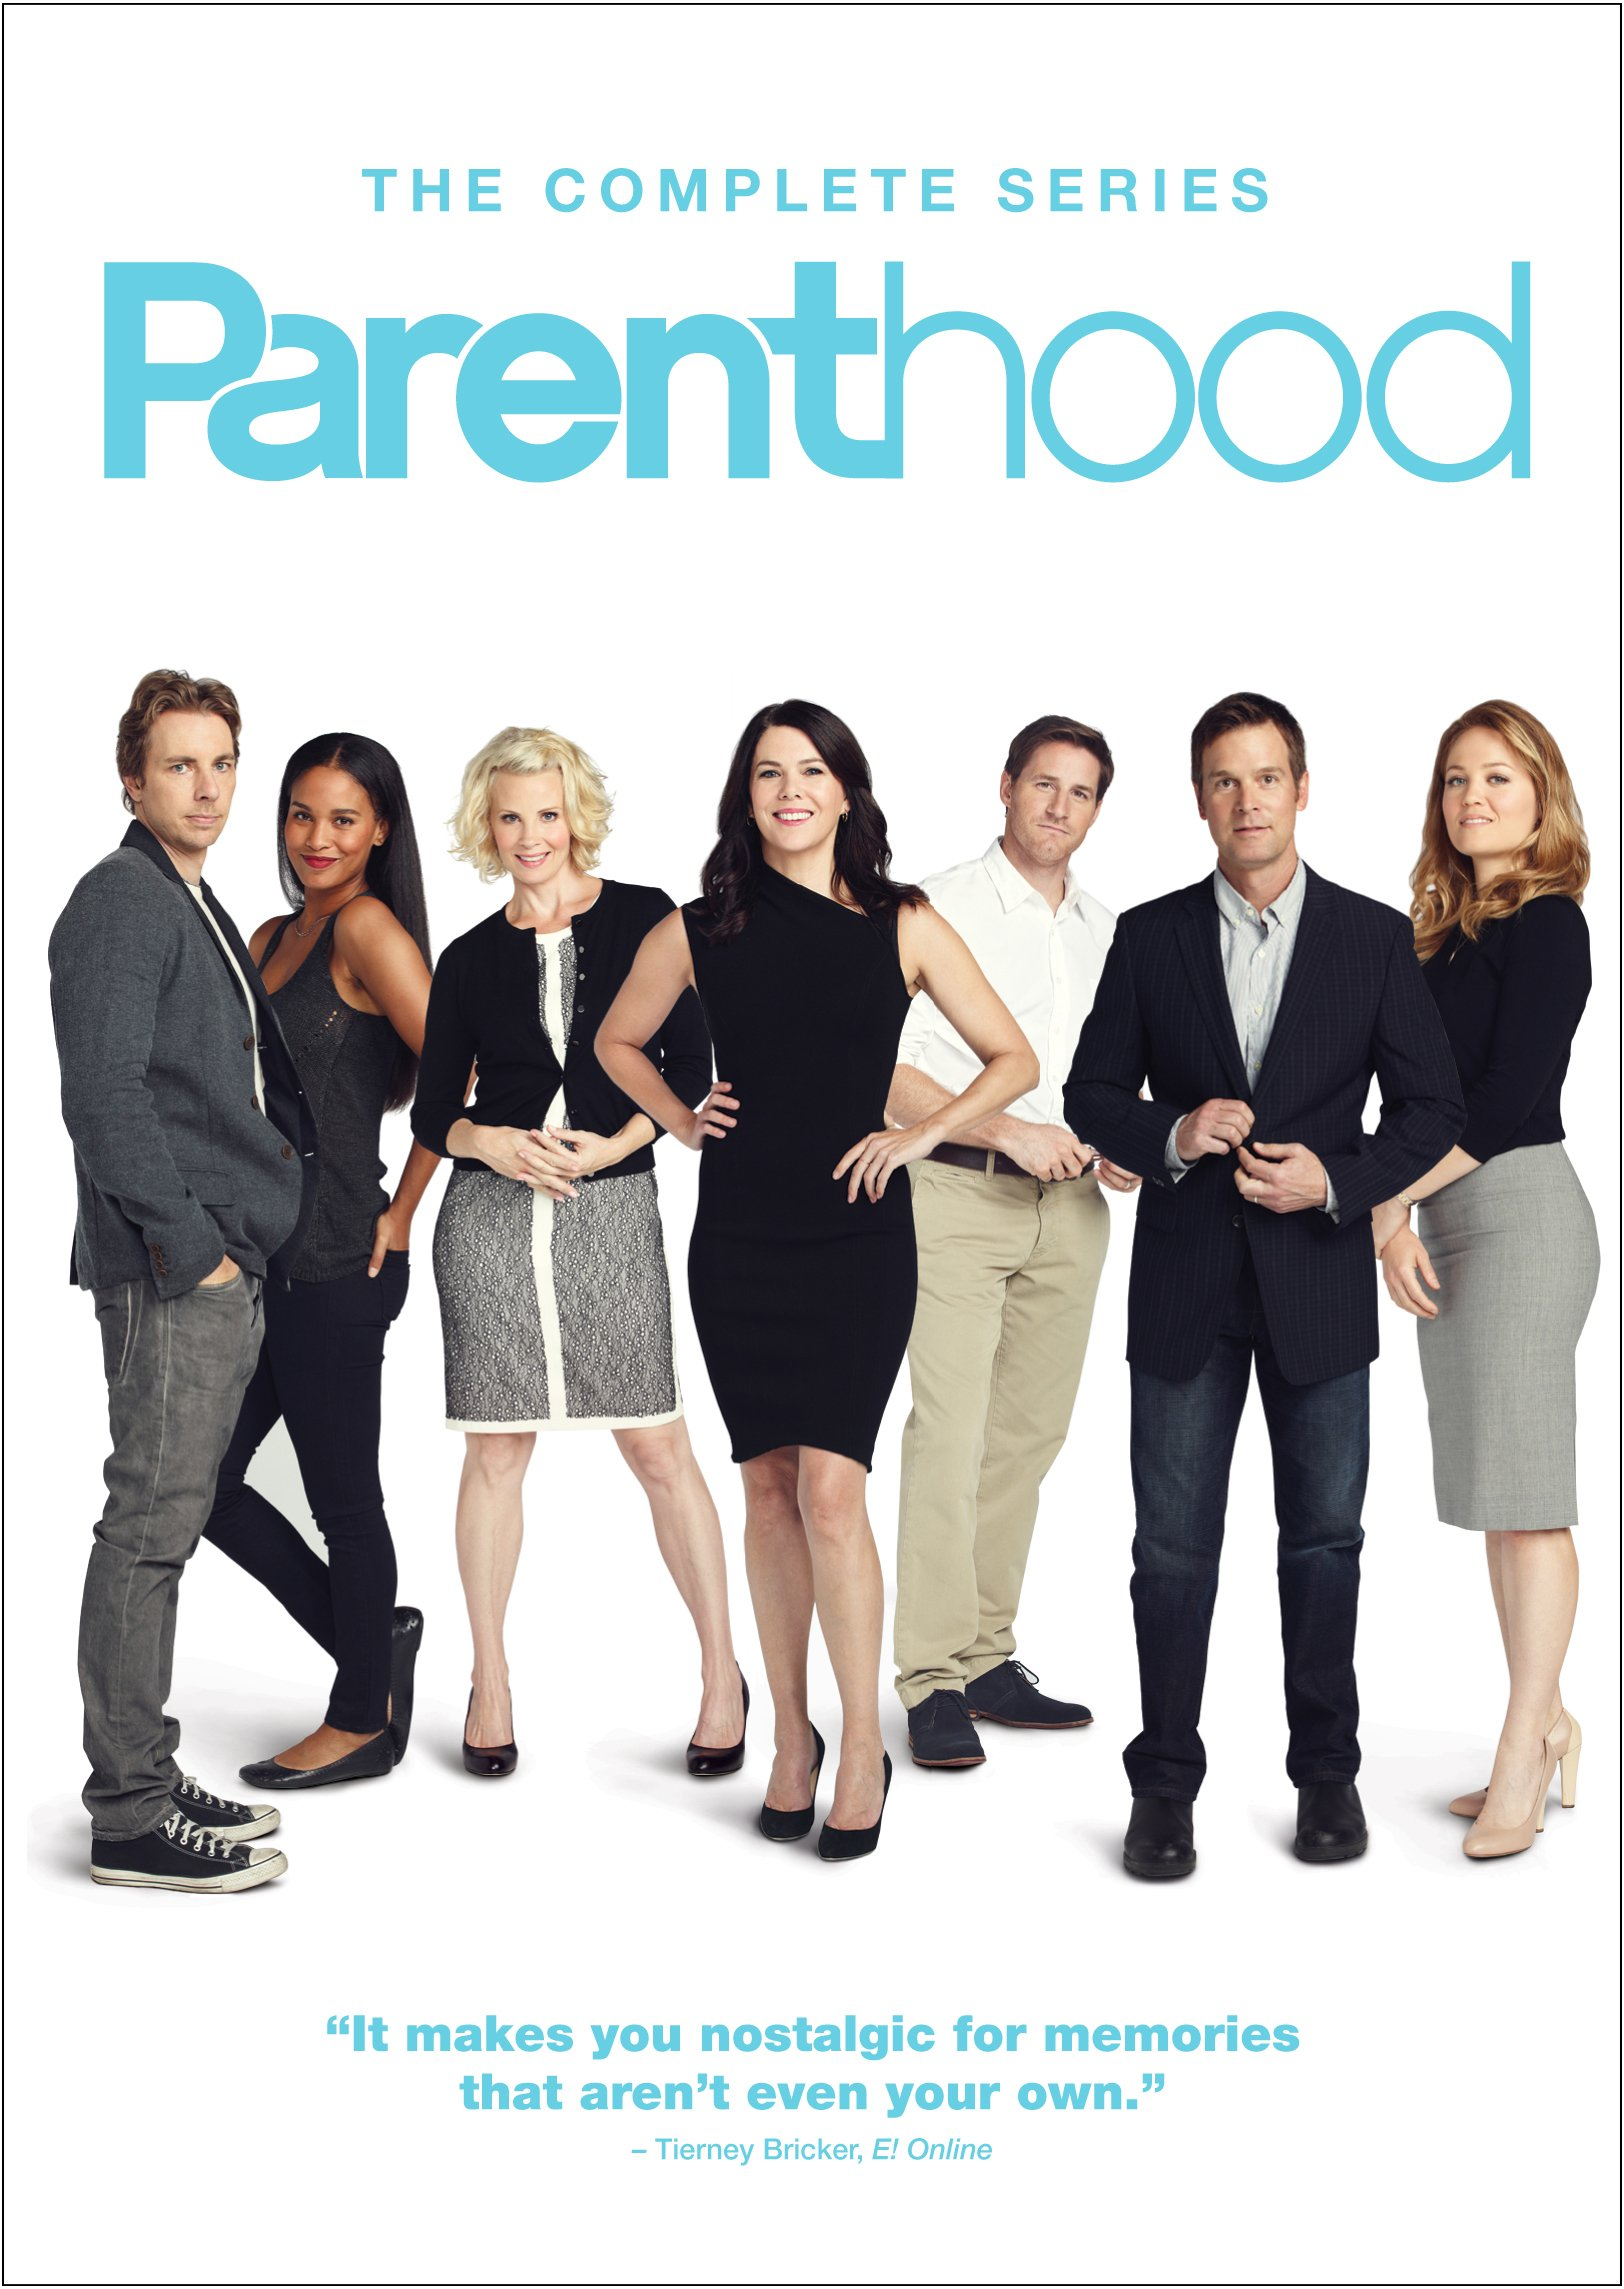 DVD : Parenthood: The Complete Series (Oversize Item Split, Boxed Set, Snap Case, 23 Disc)